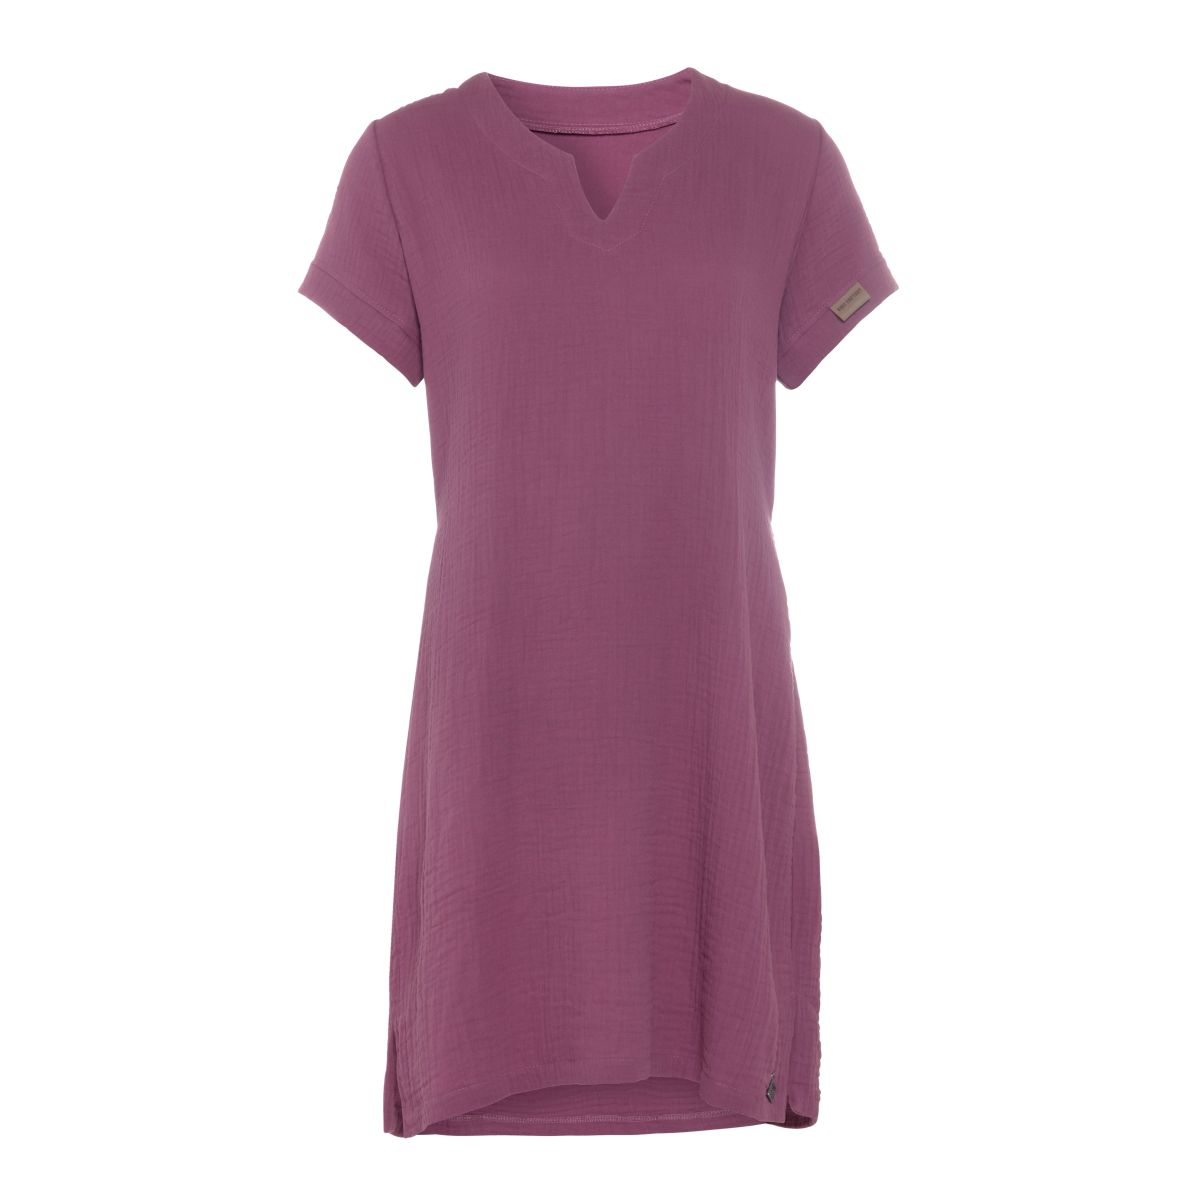 knit factory kf15012004350 indy jurk purple m 1